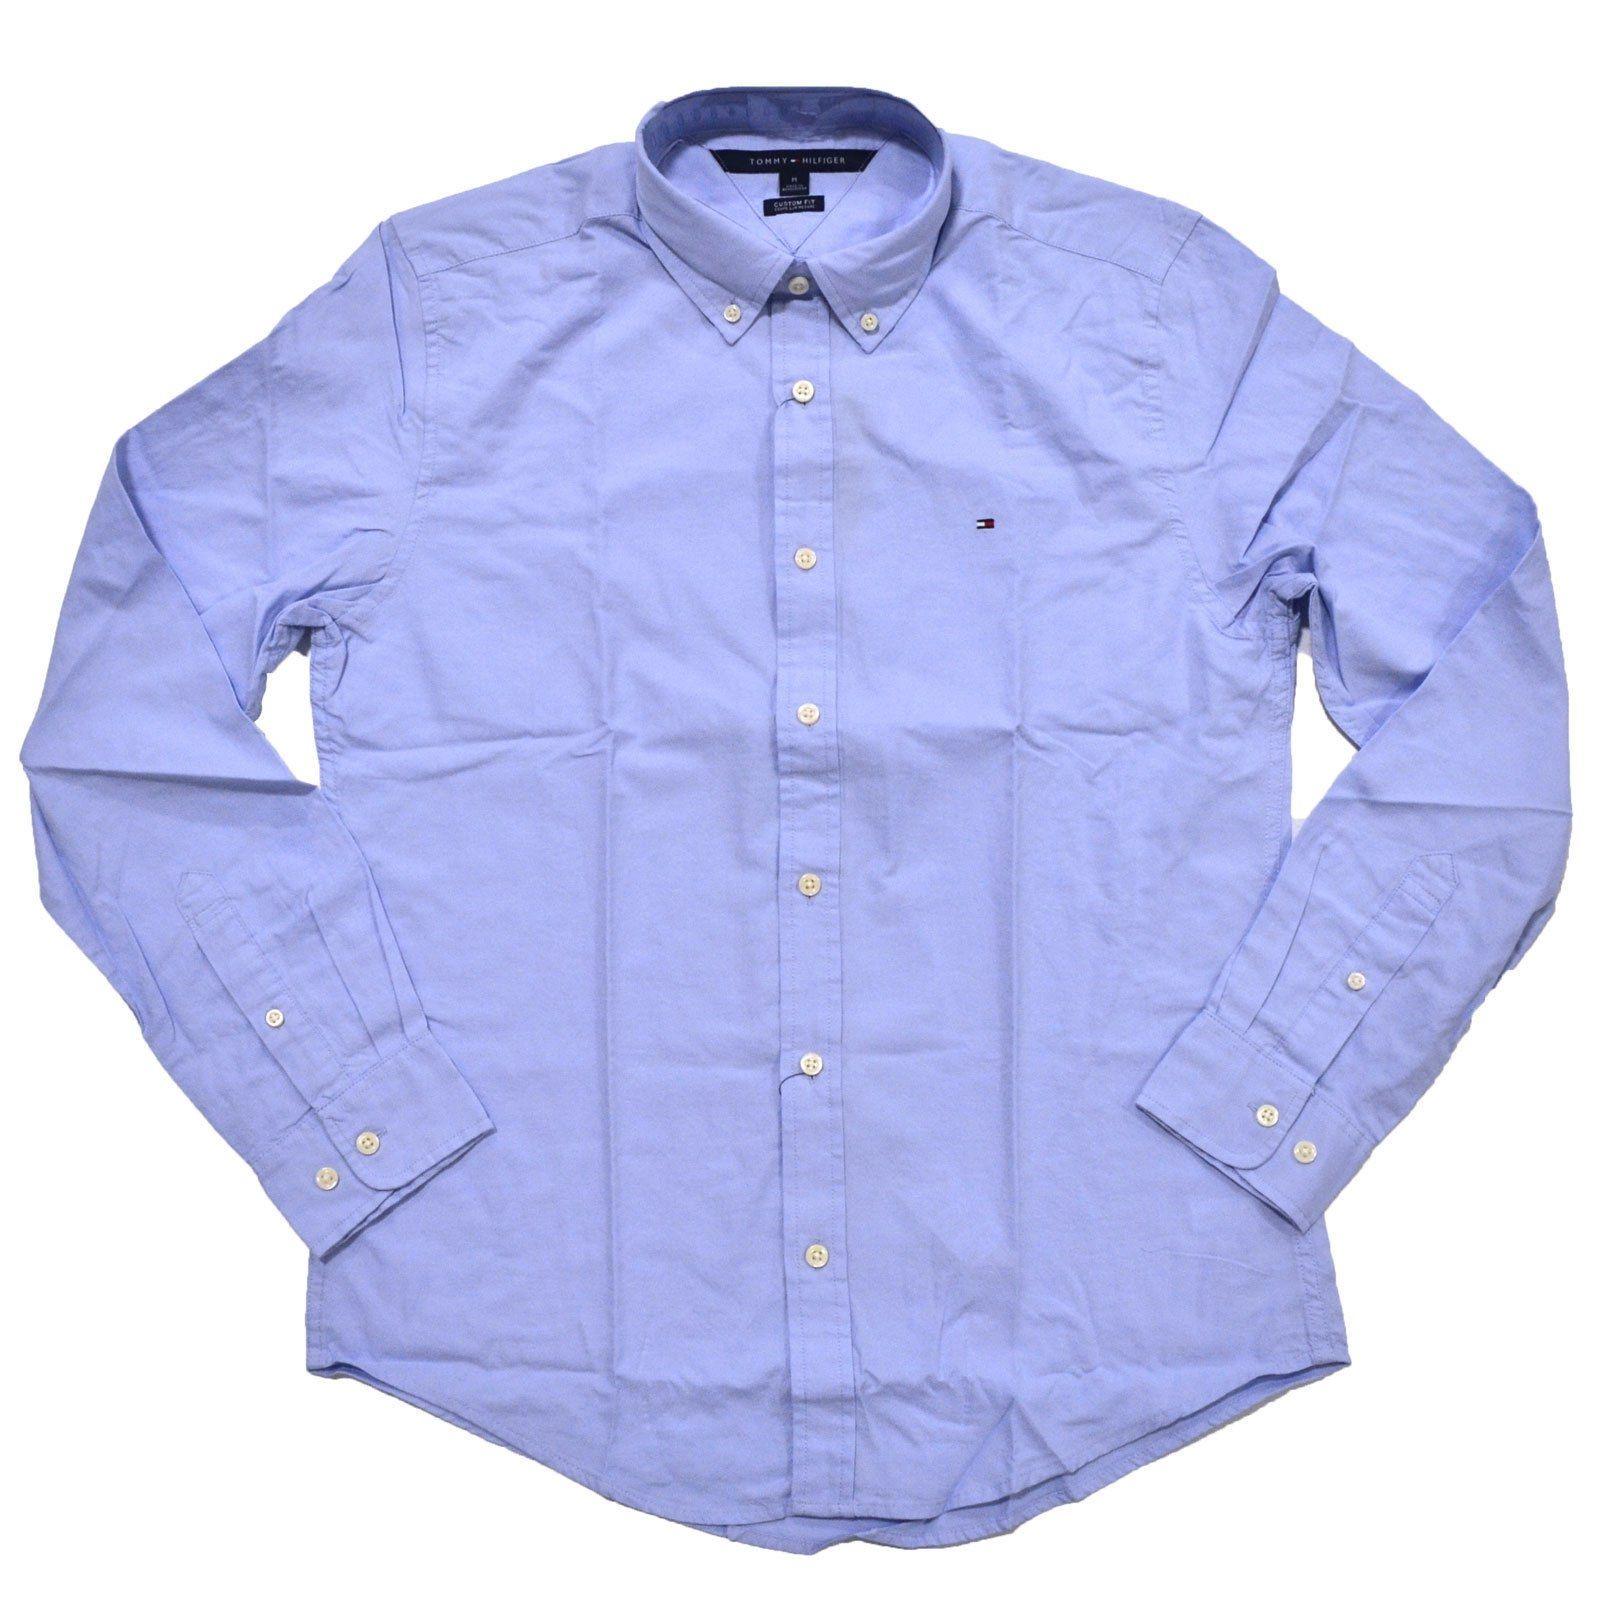 8611cdb0eb8 Tommy Hilfiger Men Custom Fit Long Sleeve Button-down Shirt - Light ...